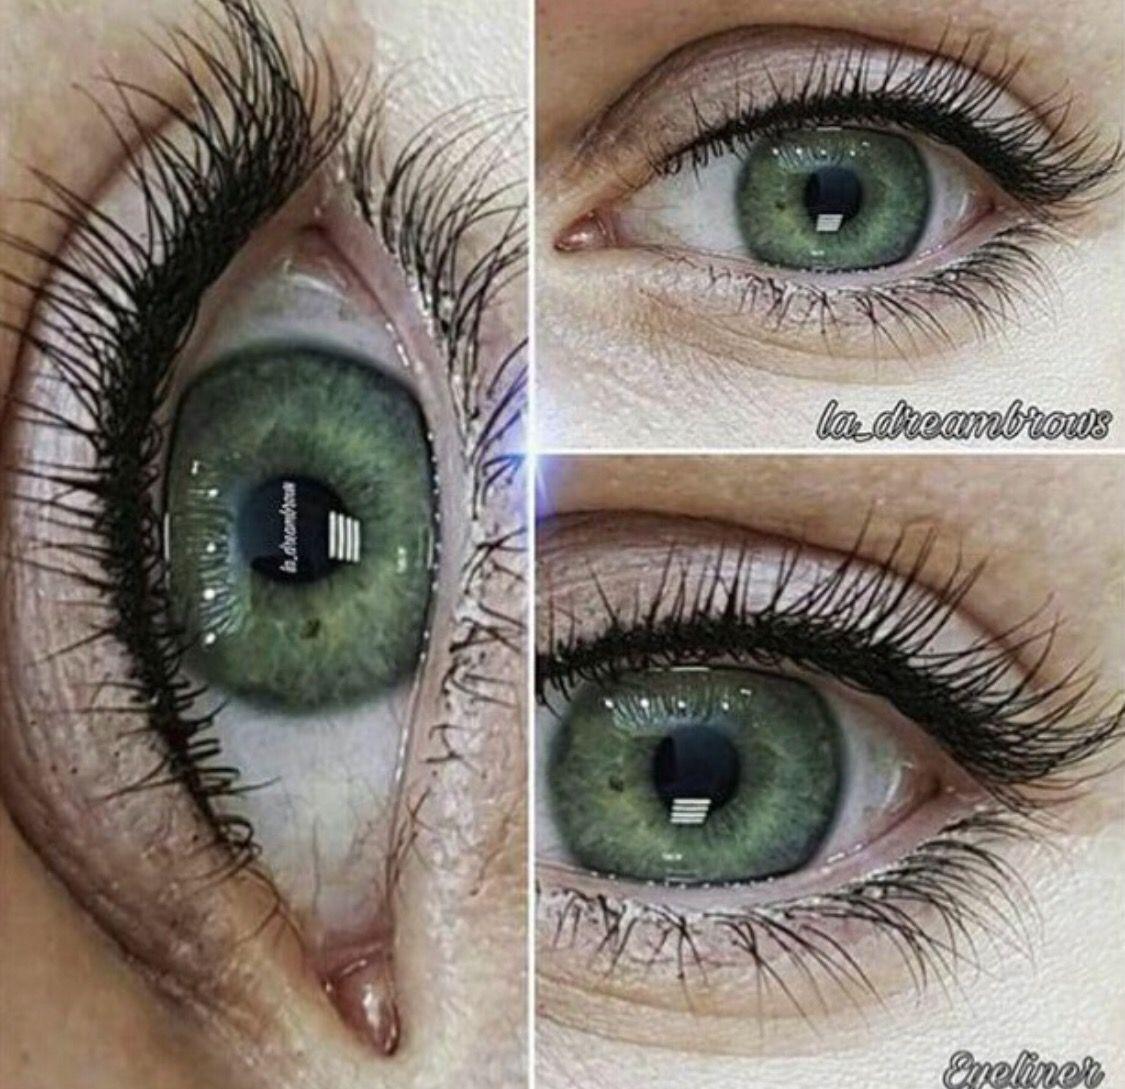 Sherman oaks,ca Permanent eyeliner, Permanent makeup